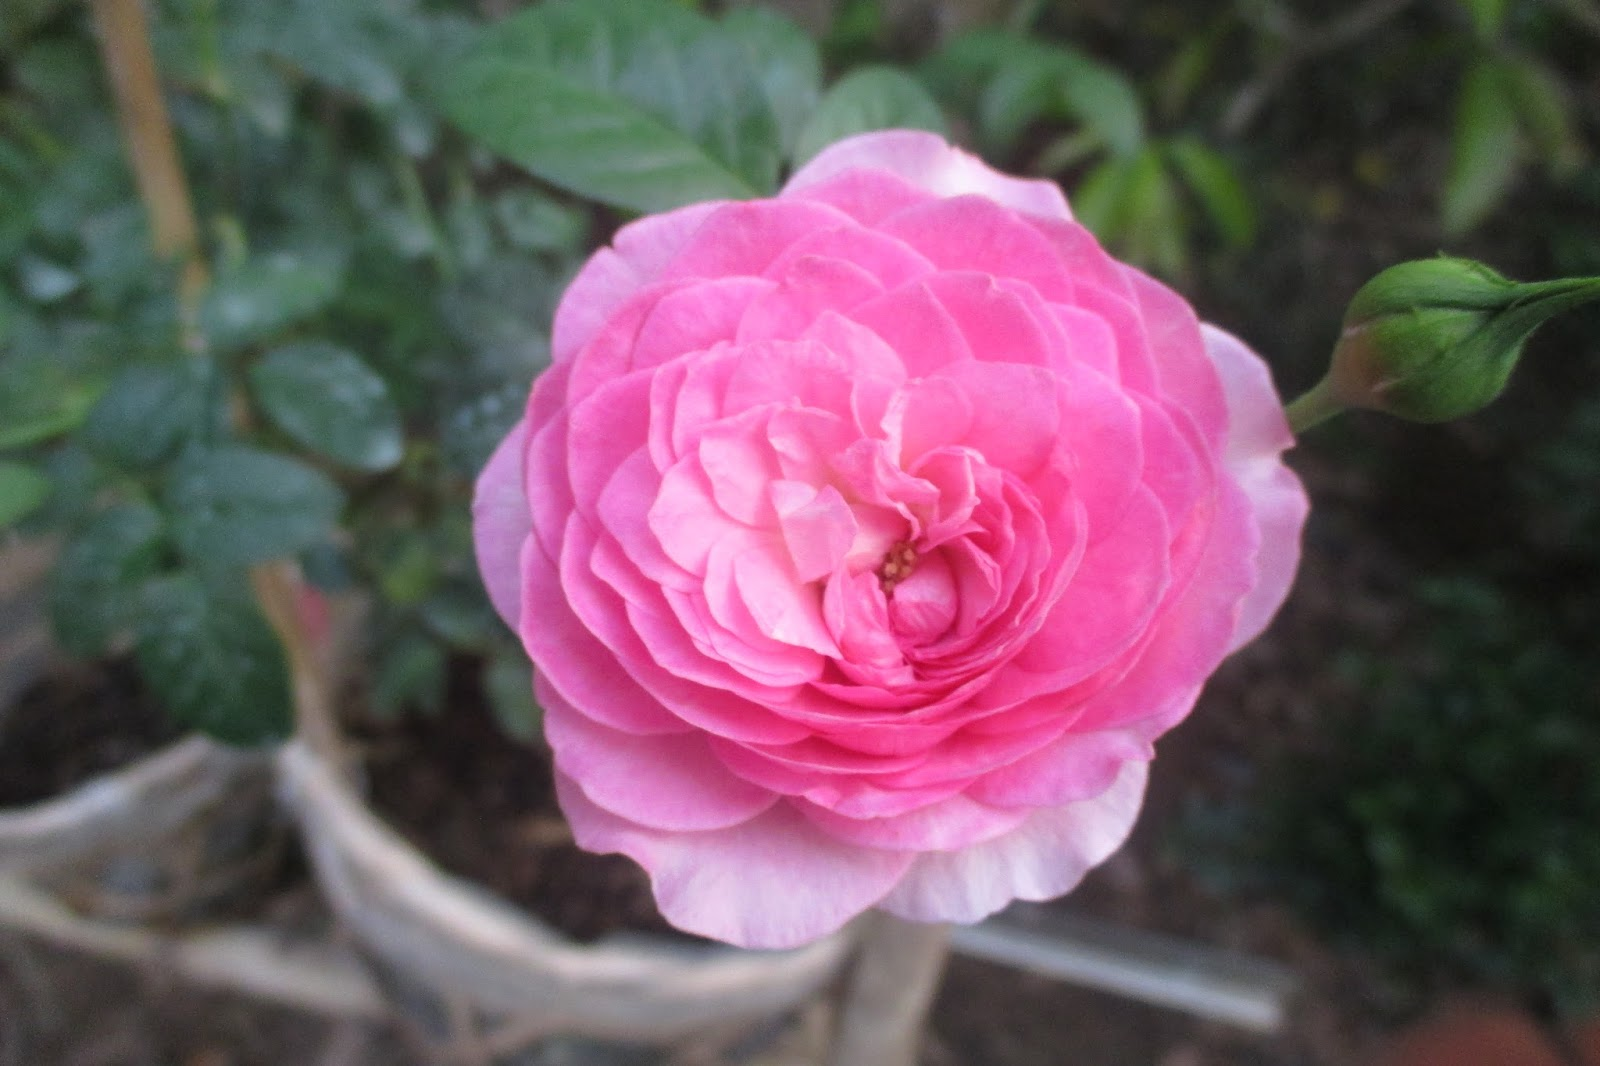 Form hoa hồng Nhật Bản Mon Coeur khi mới trồng